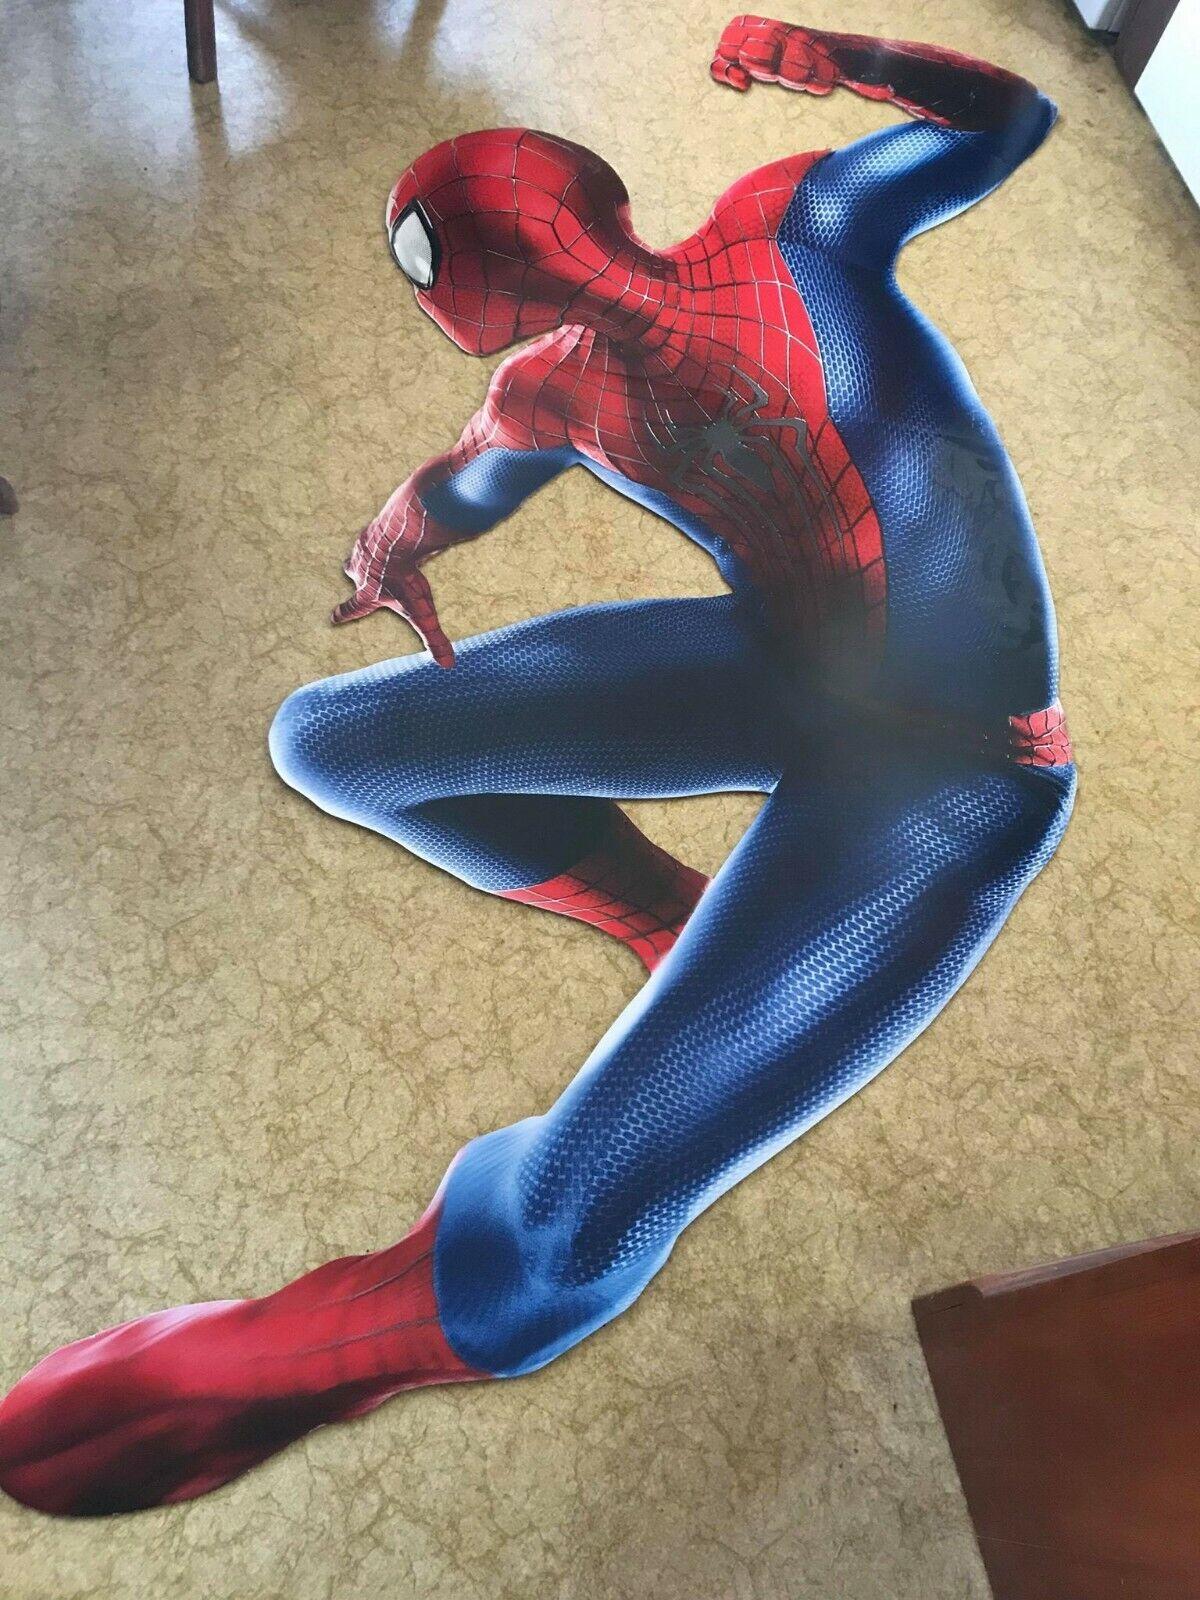 SPIDERMAN SUPER SUPER SUPER HERO CARDBOARD CUTOUT (about 5 feet) MARVEL COMICS DISPLAY MOVIE 79b7f8